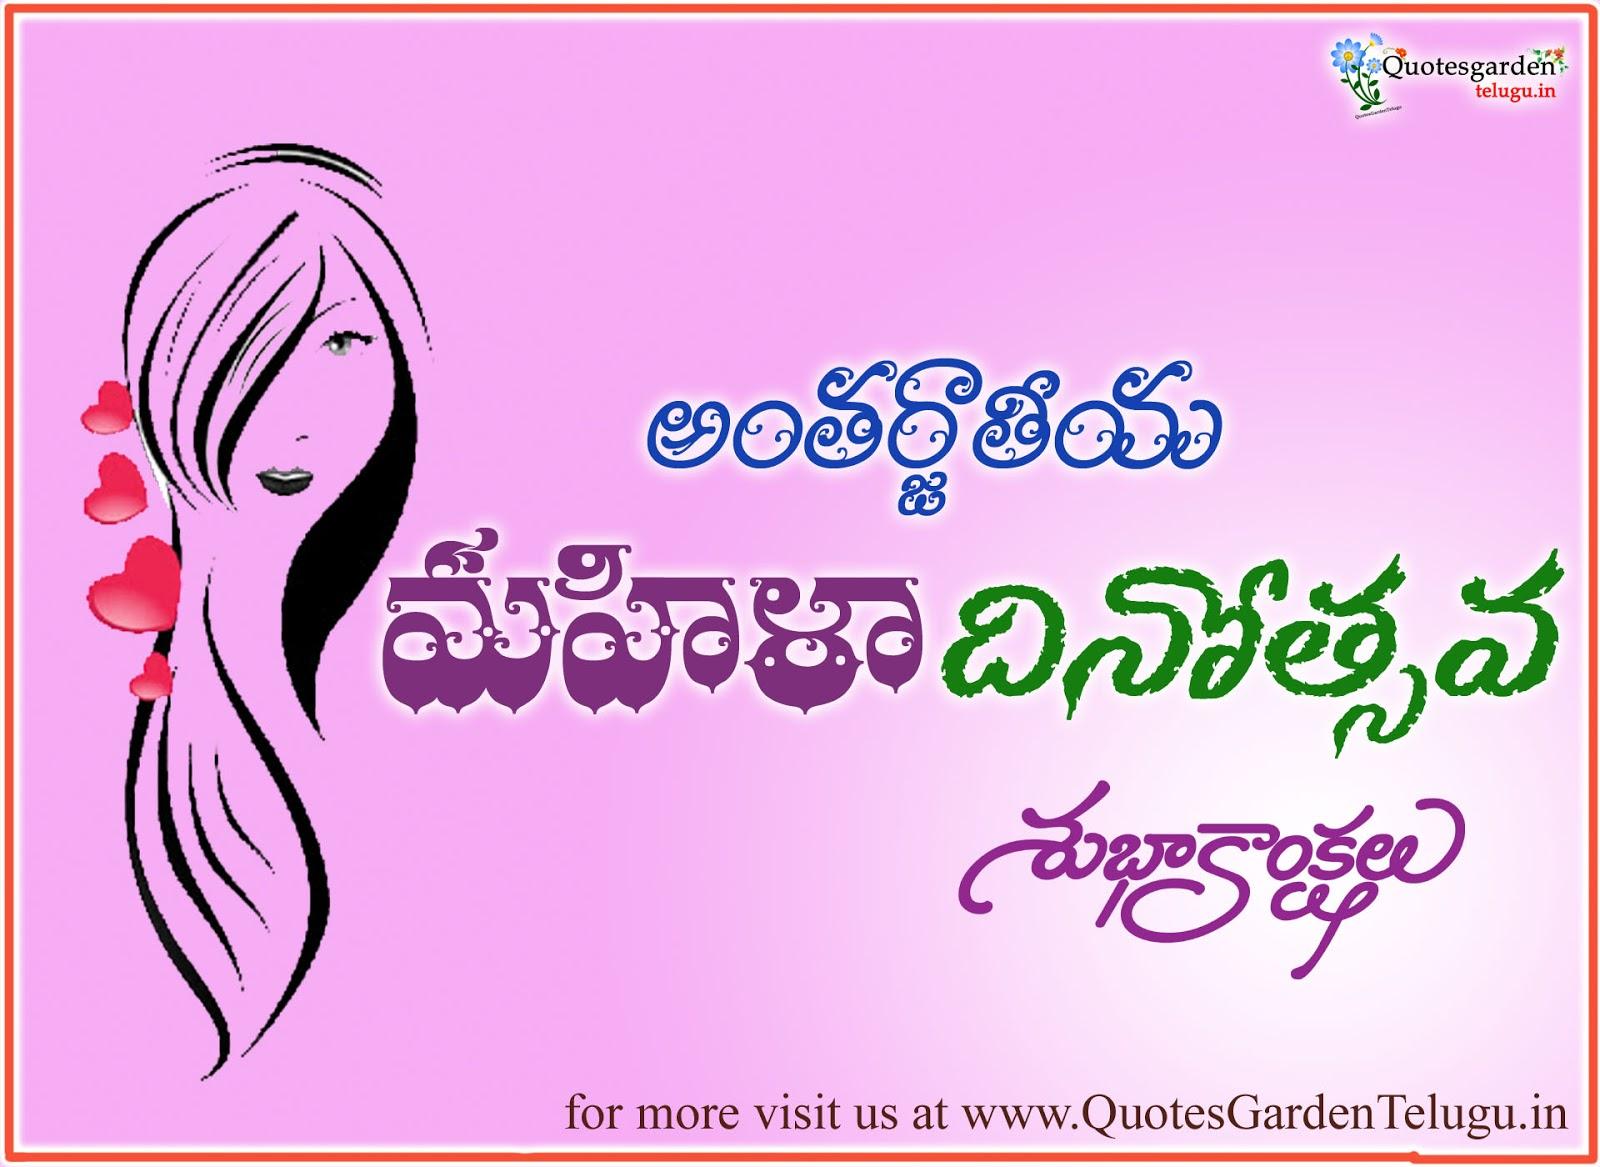 Happy Womens Day Greetings In Telugu Quotes Garden Telugu Telugu